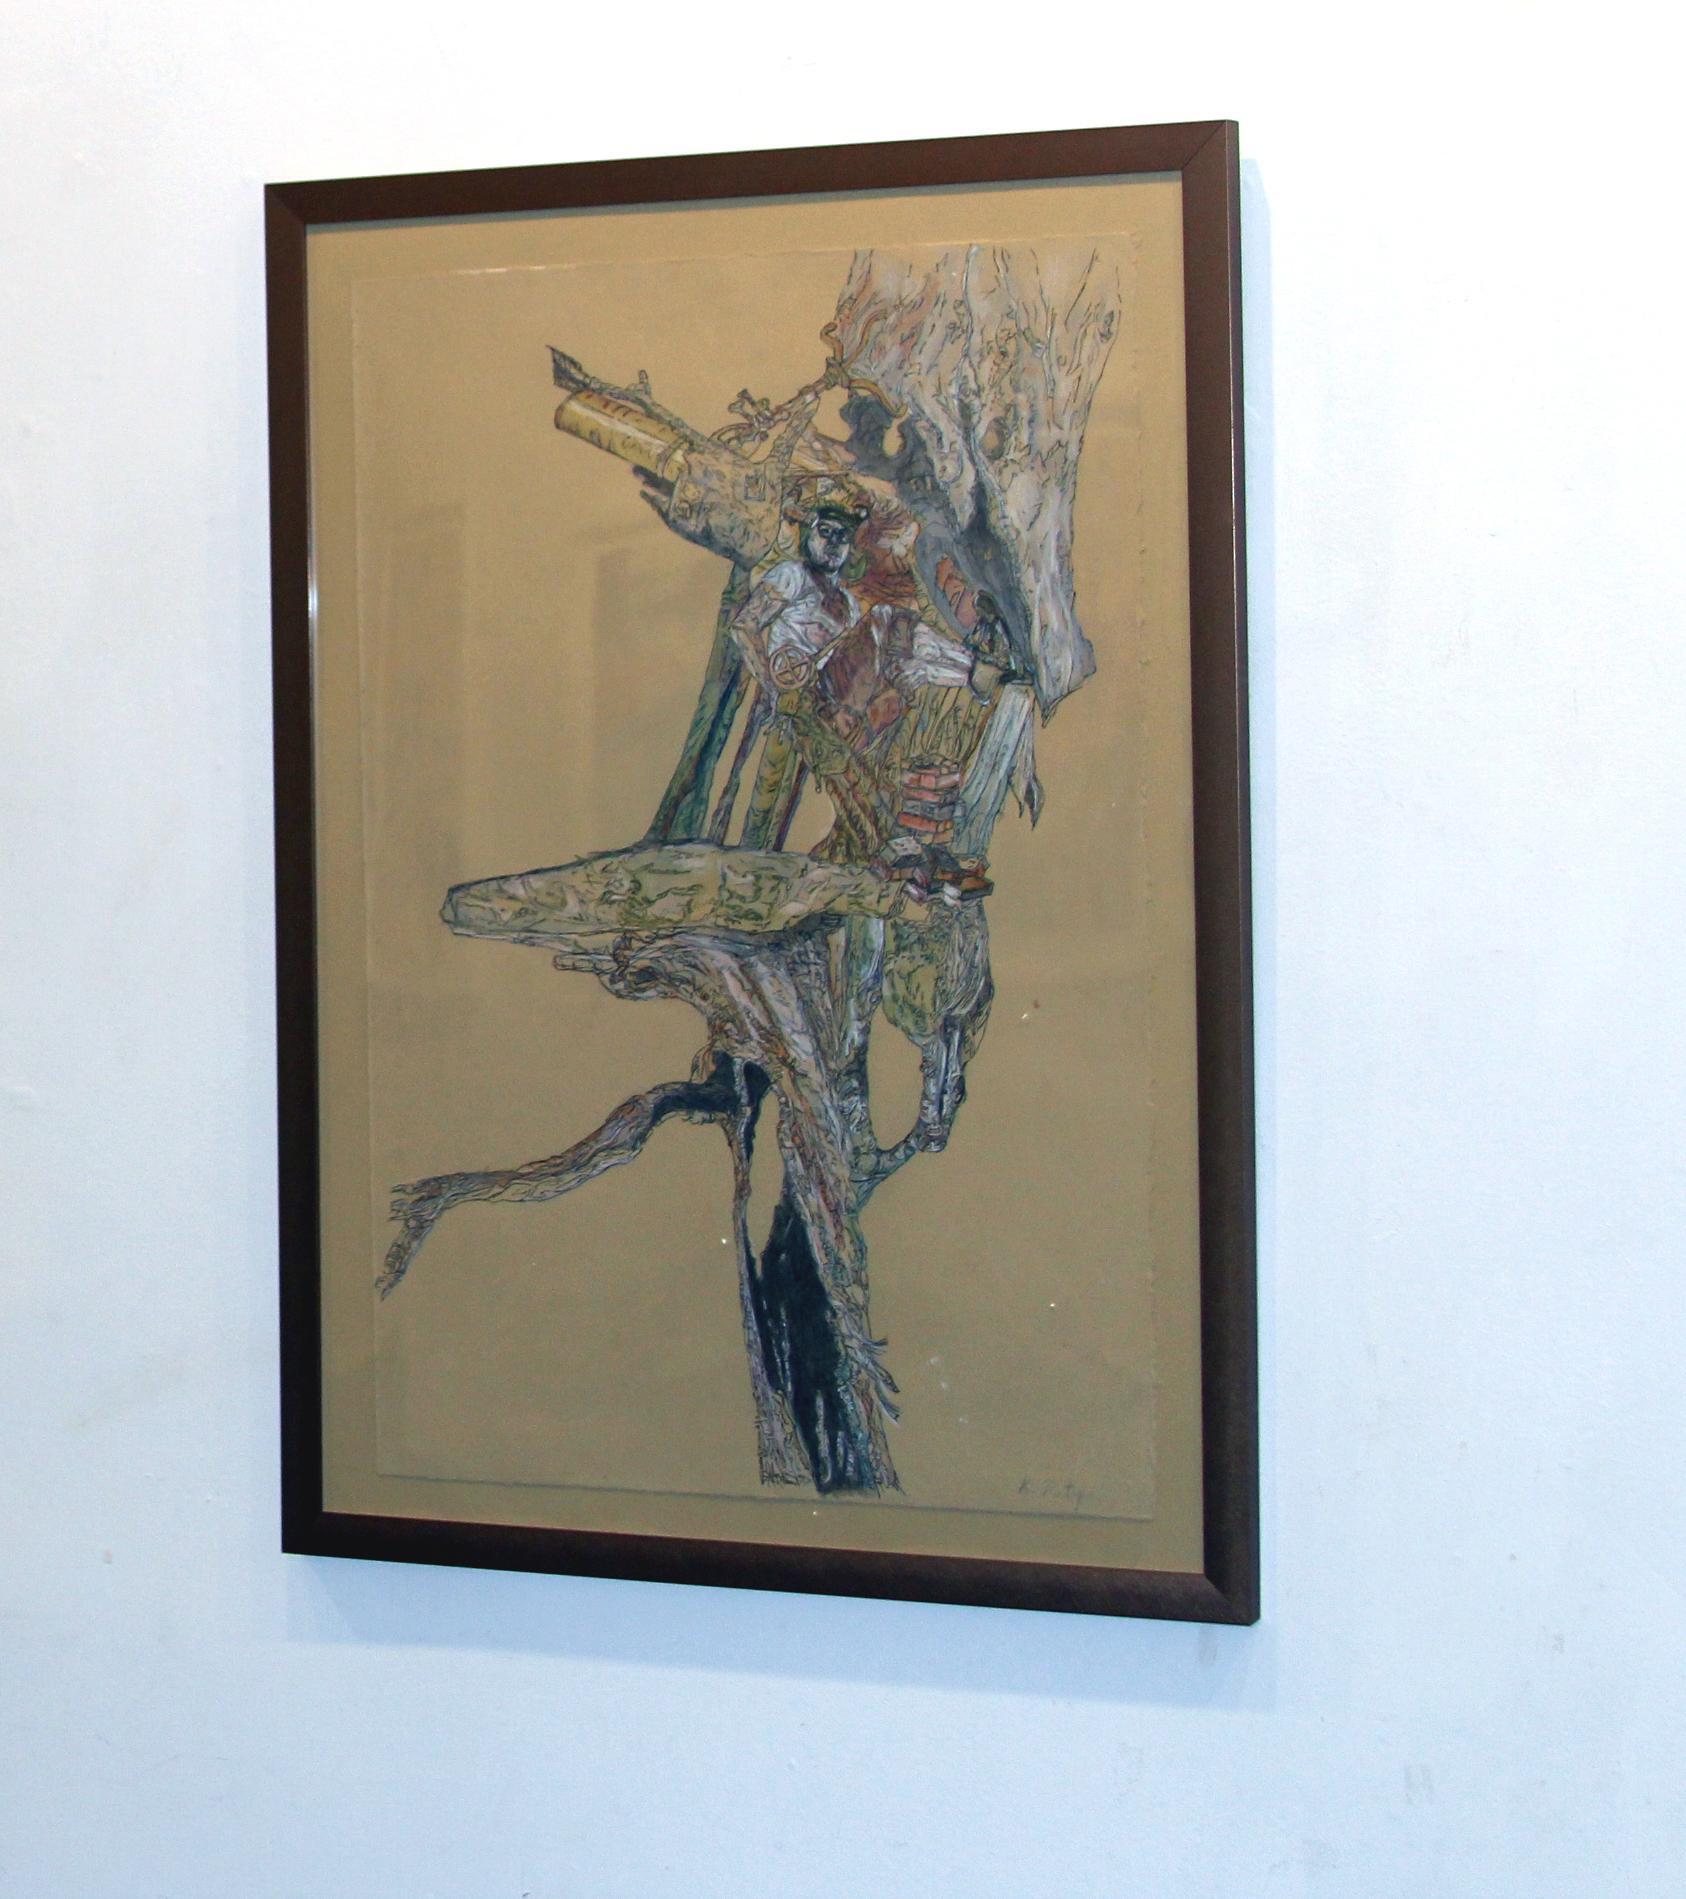 Explorer, Figurative, Drawing, Inventor, Illustration, Tree, Male Figure